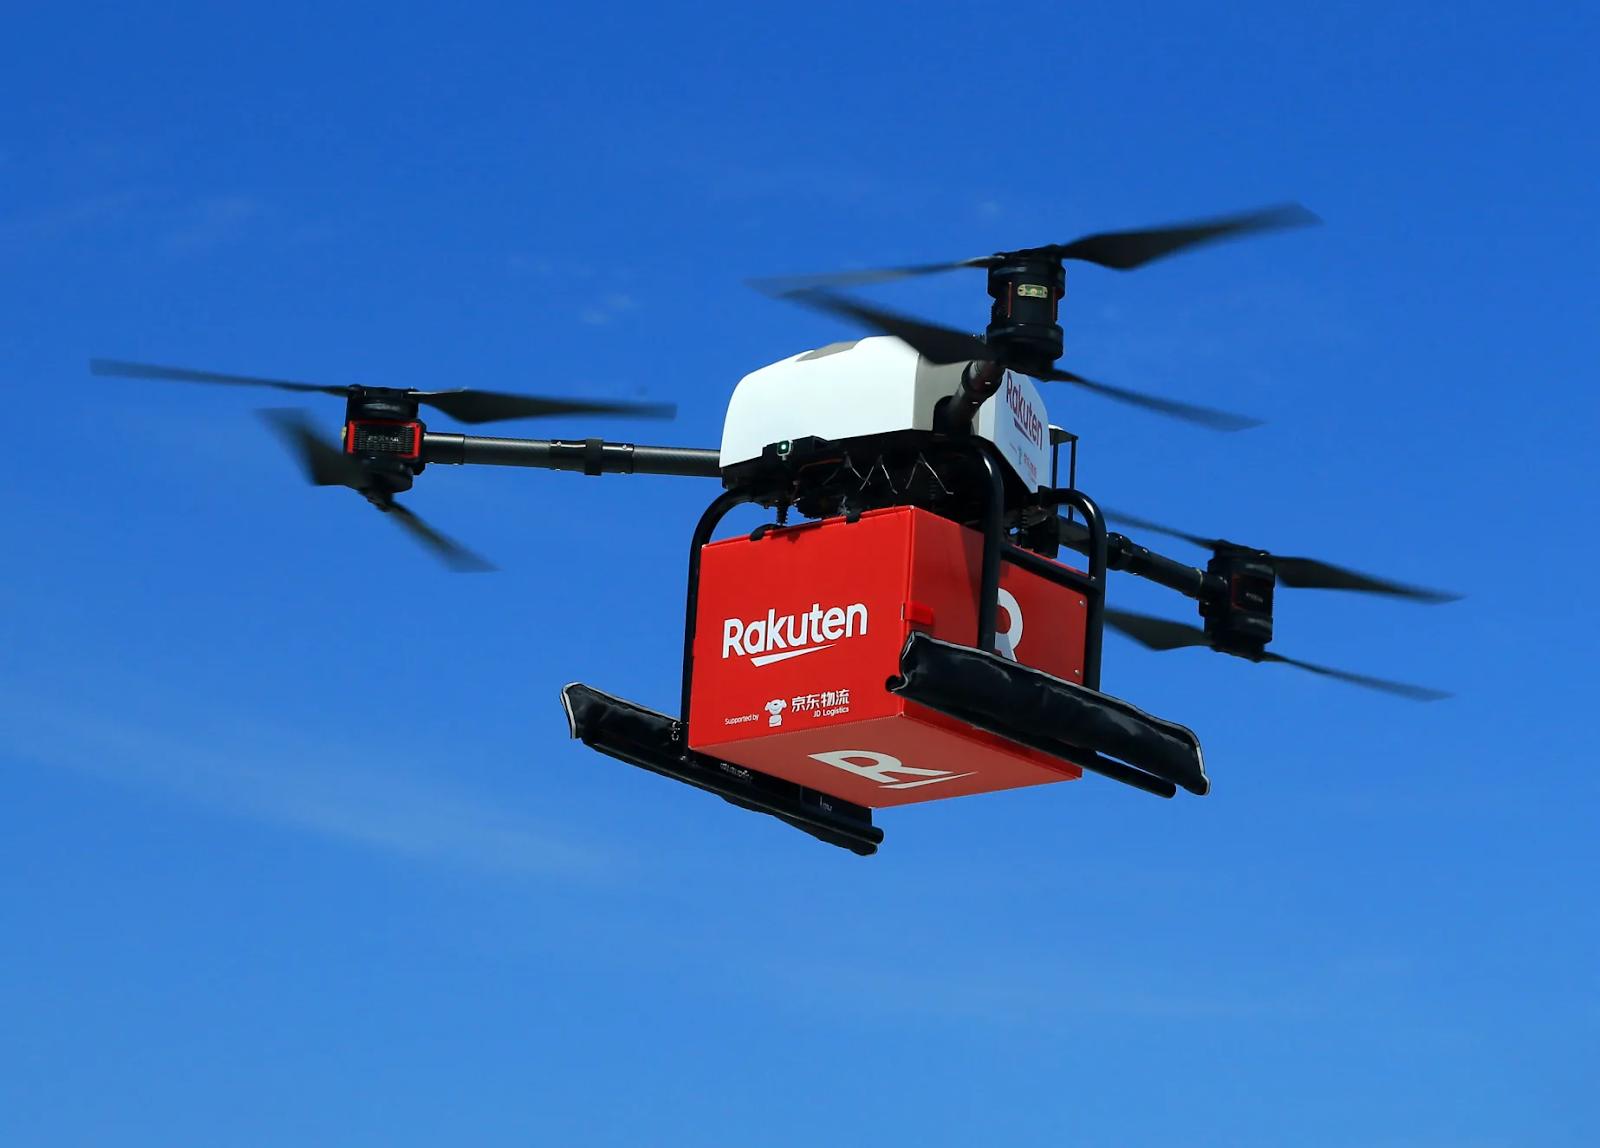 Rakuten drones